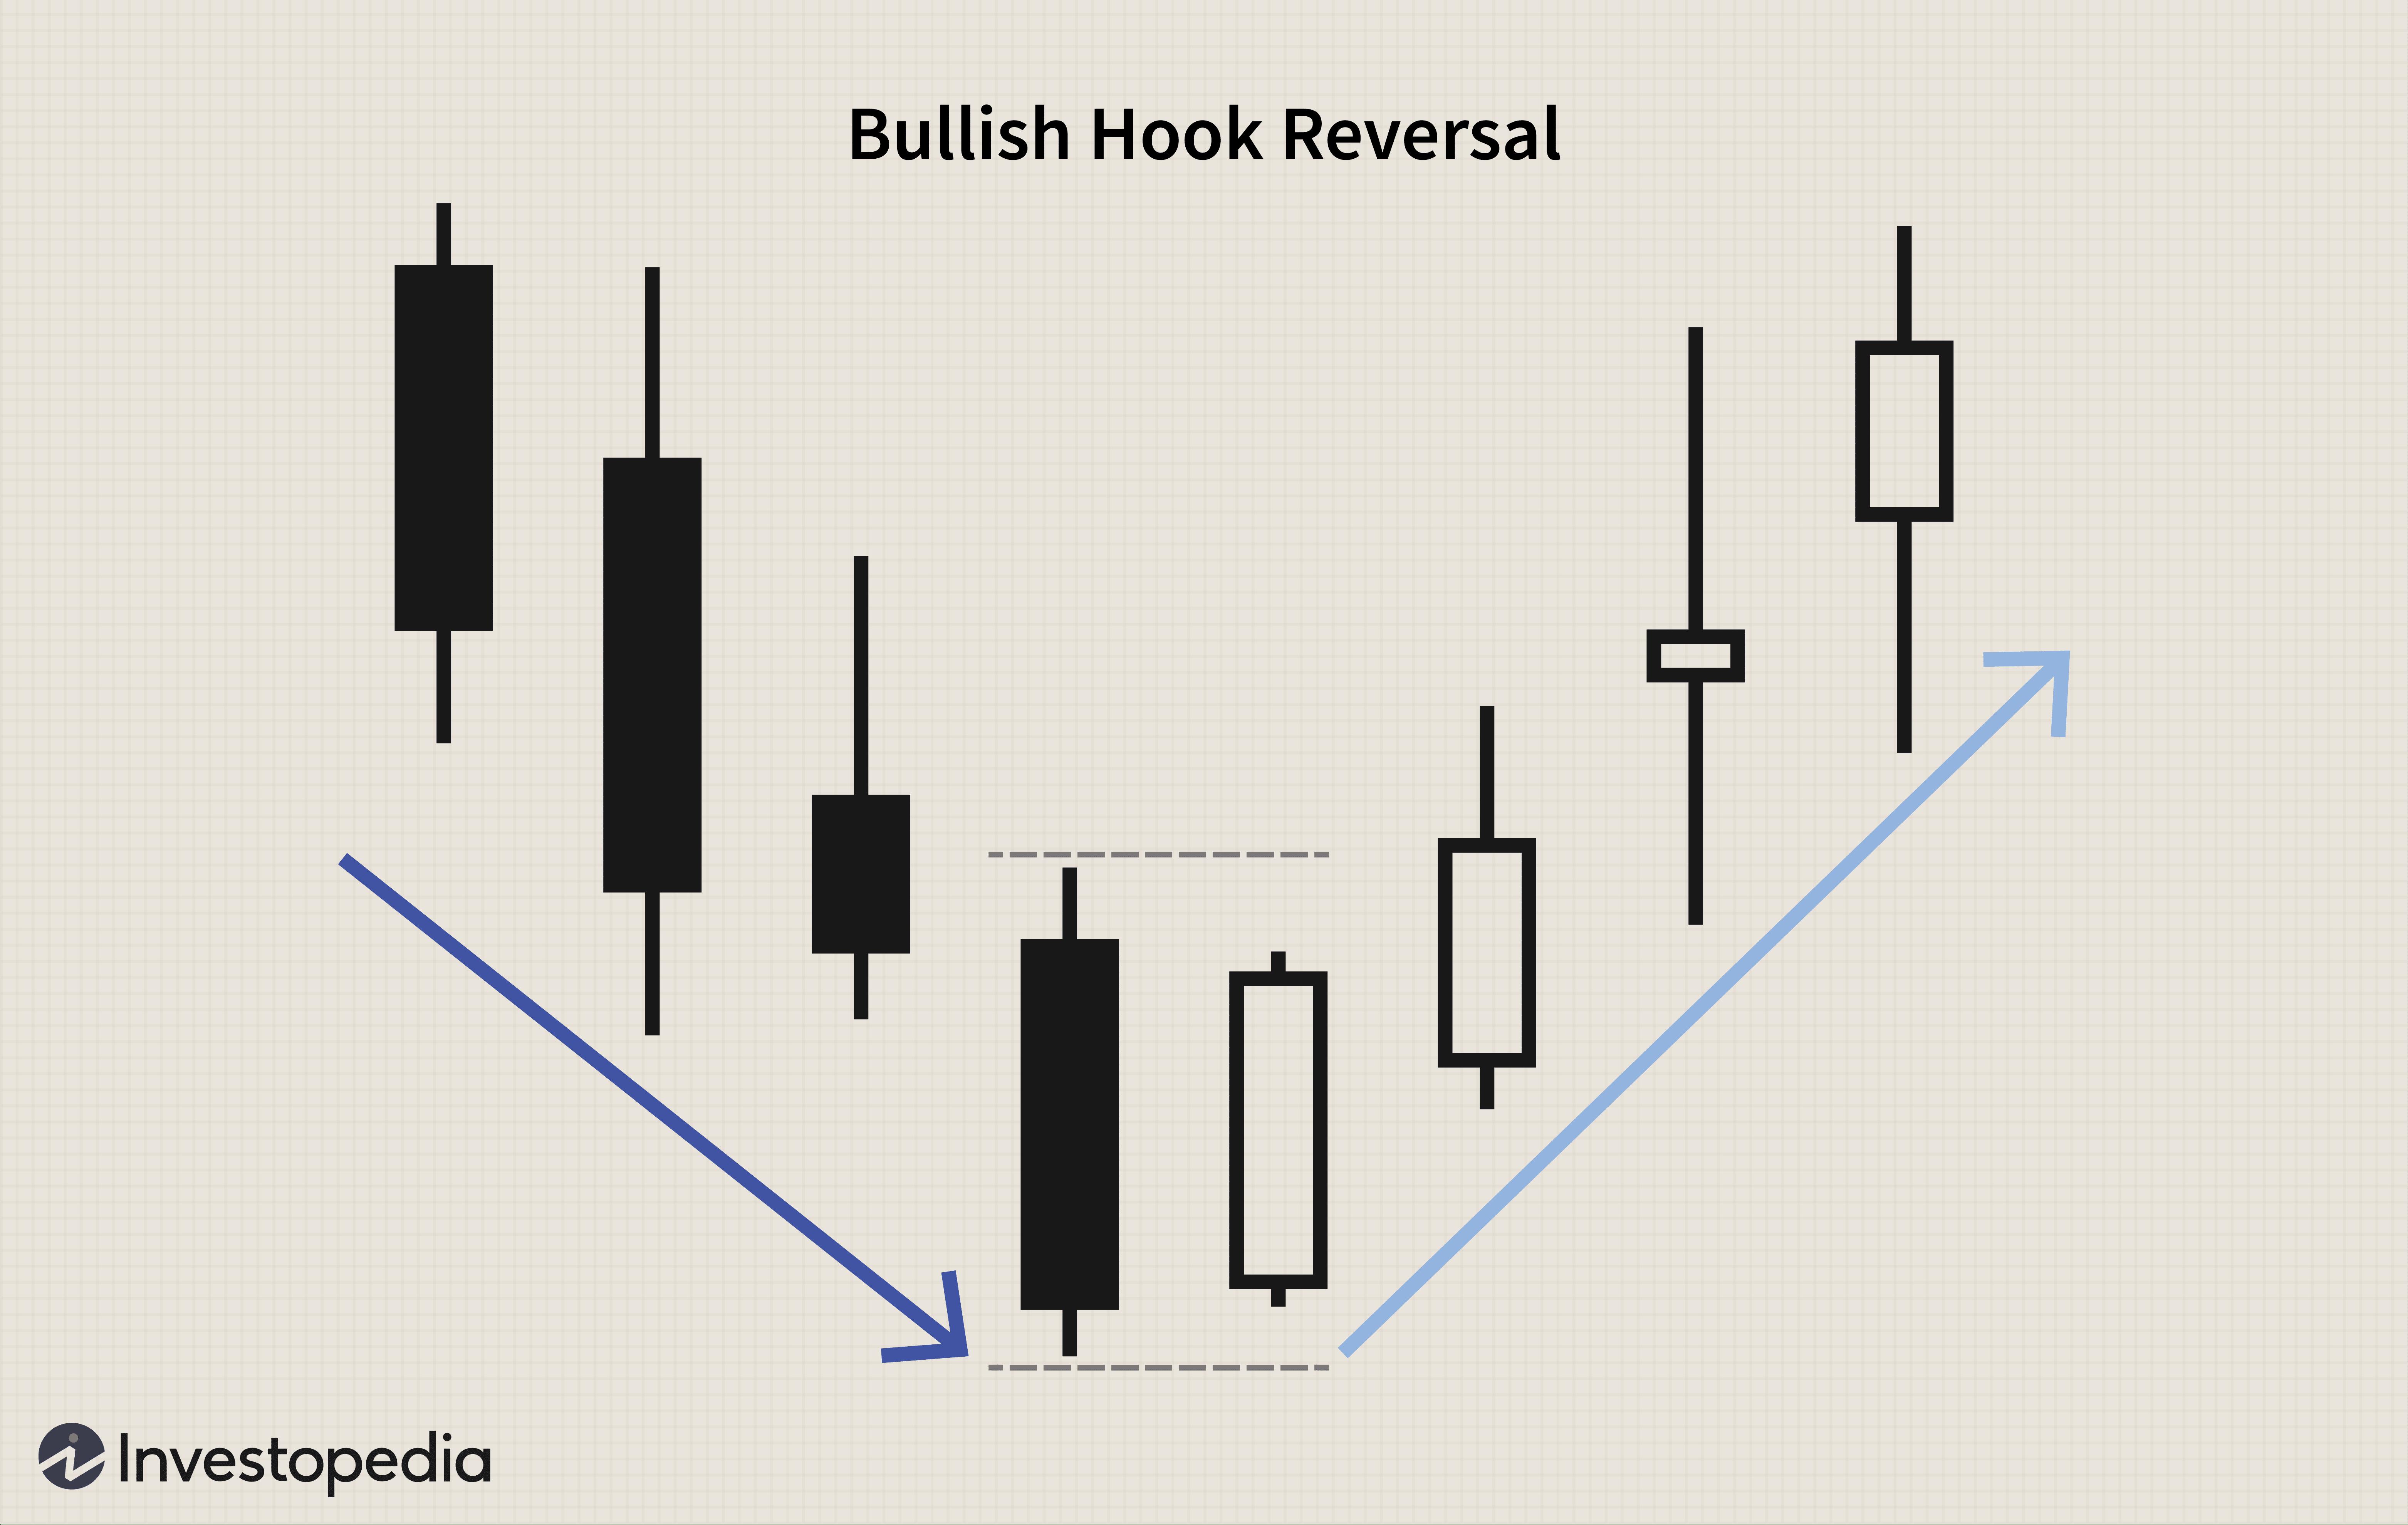 Bullish Hook Reversal